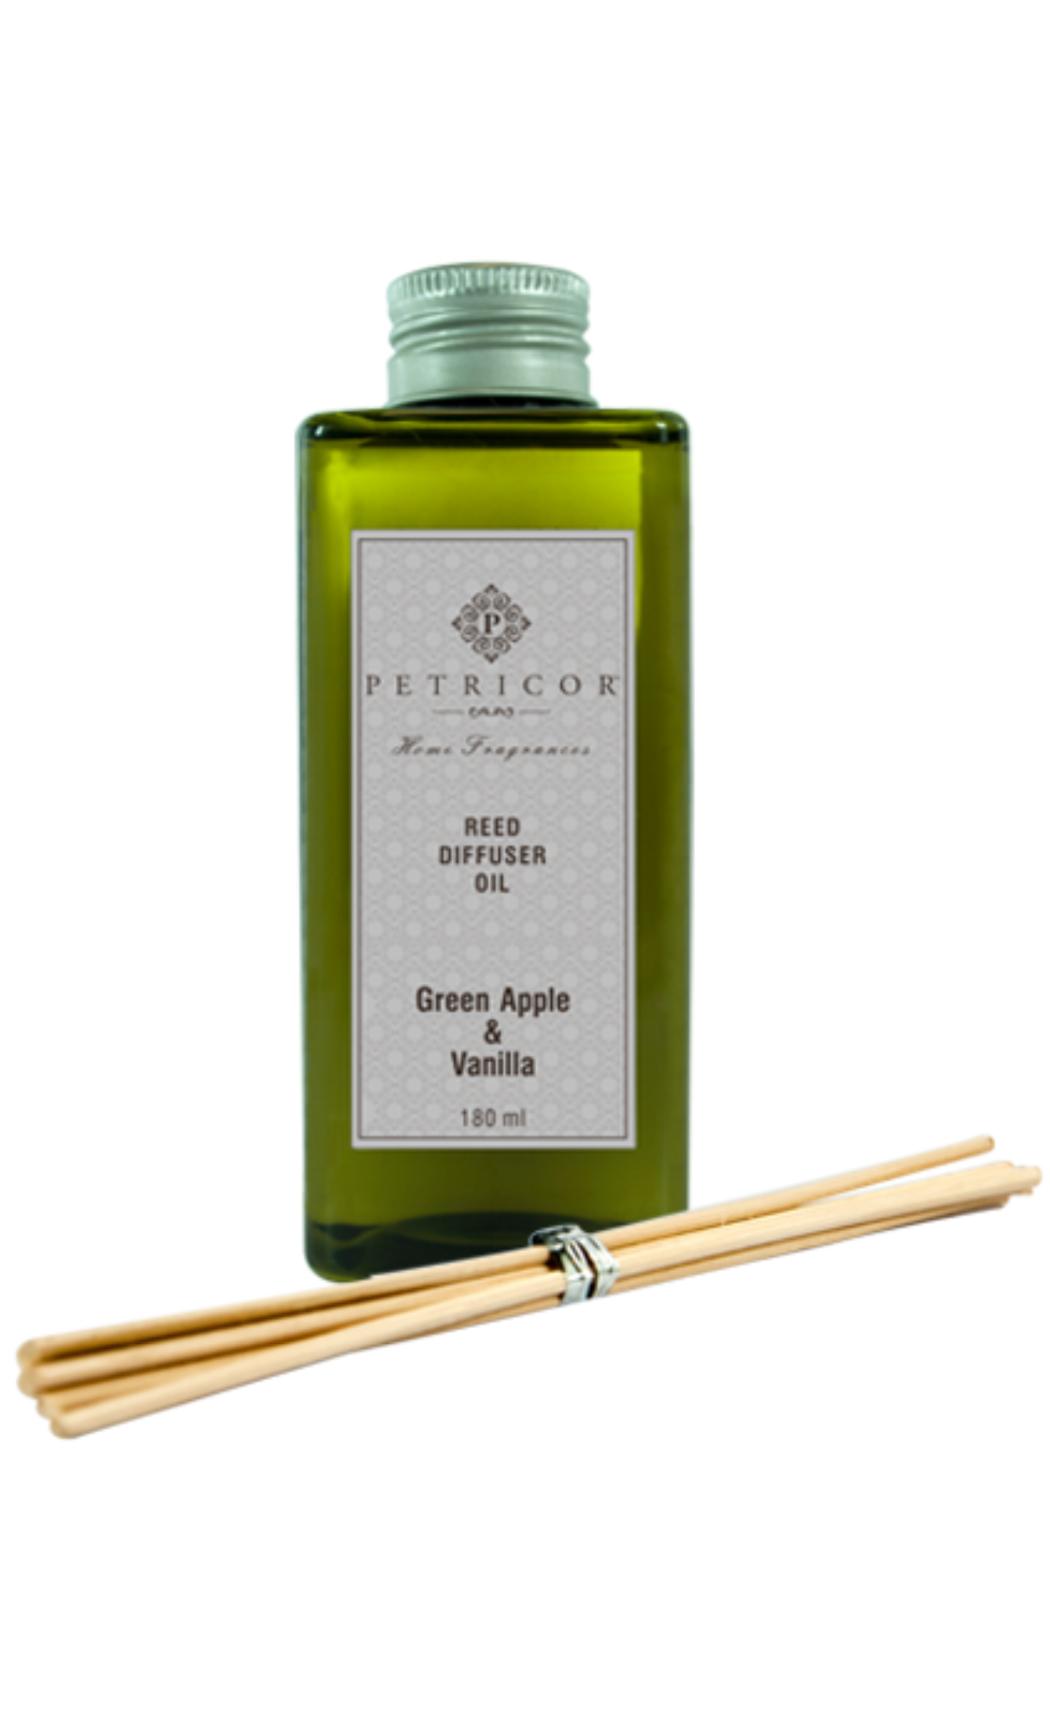 Green Tea Rose Scented Reed Diffuser Sticks - Shop Online